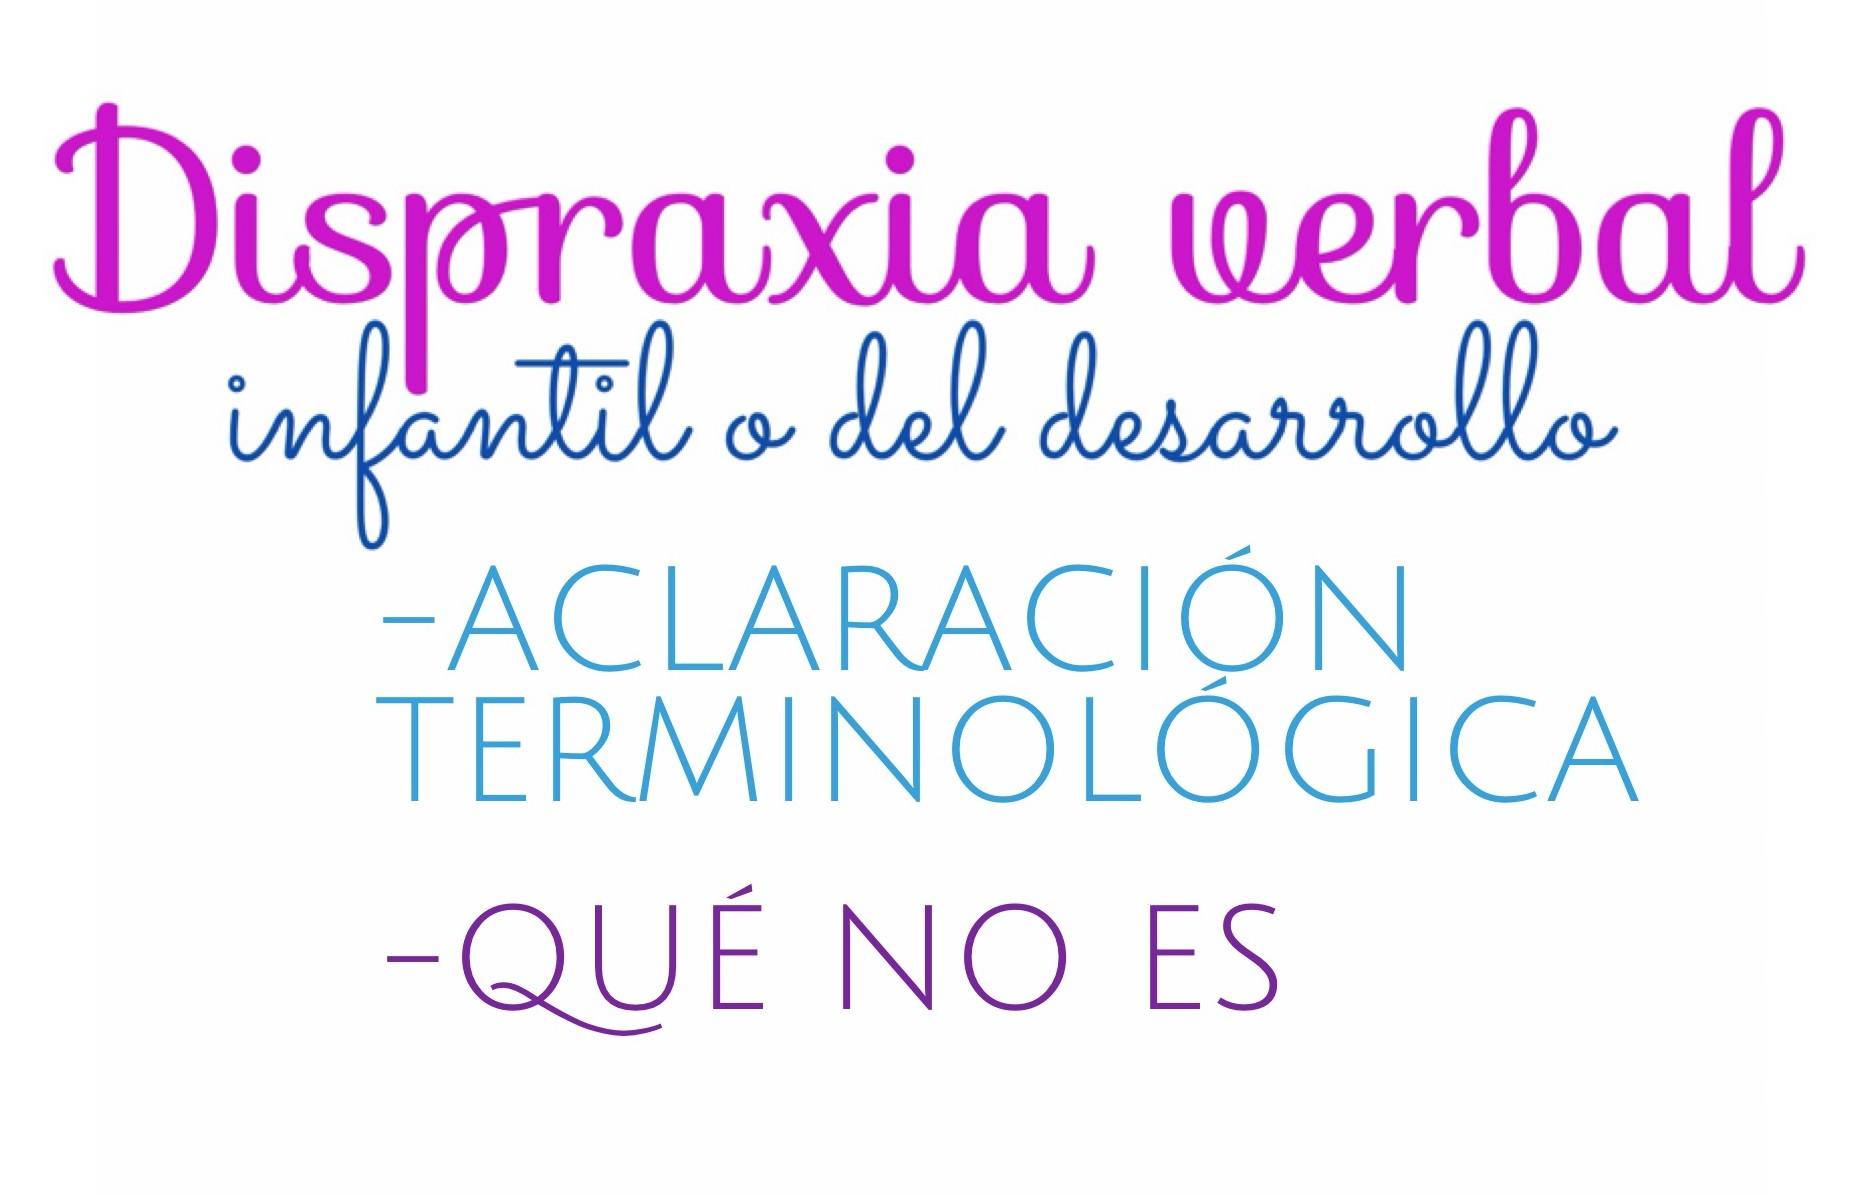 Dispraxia verbal